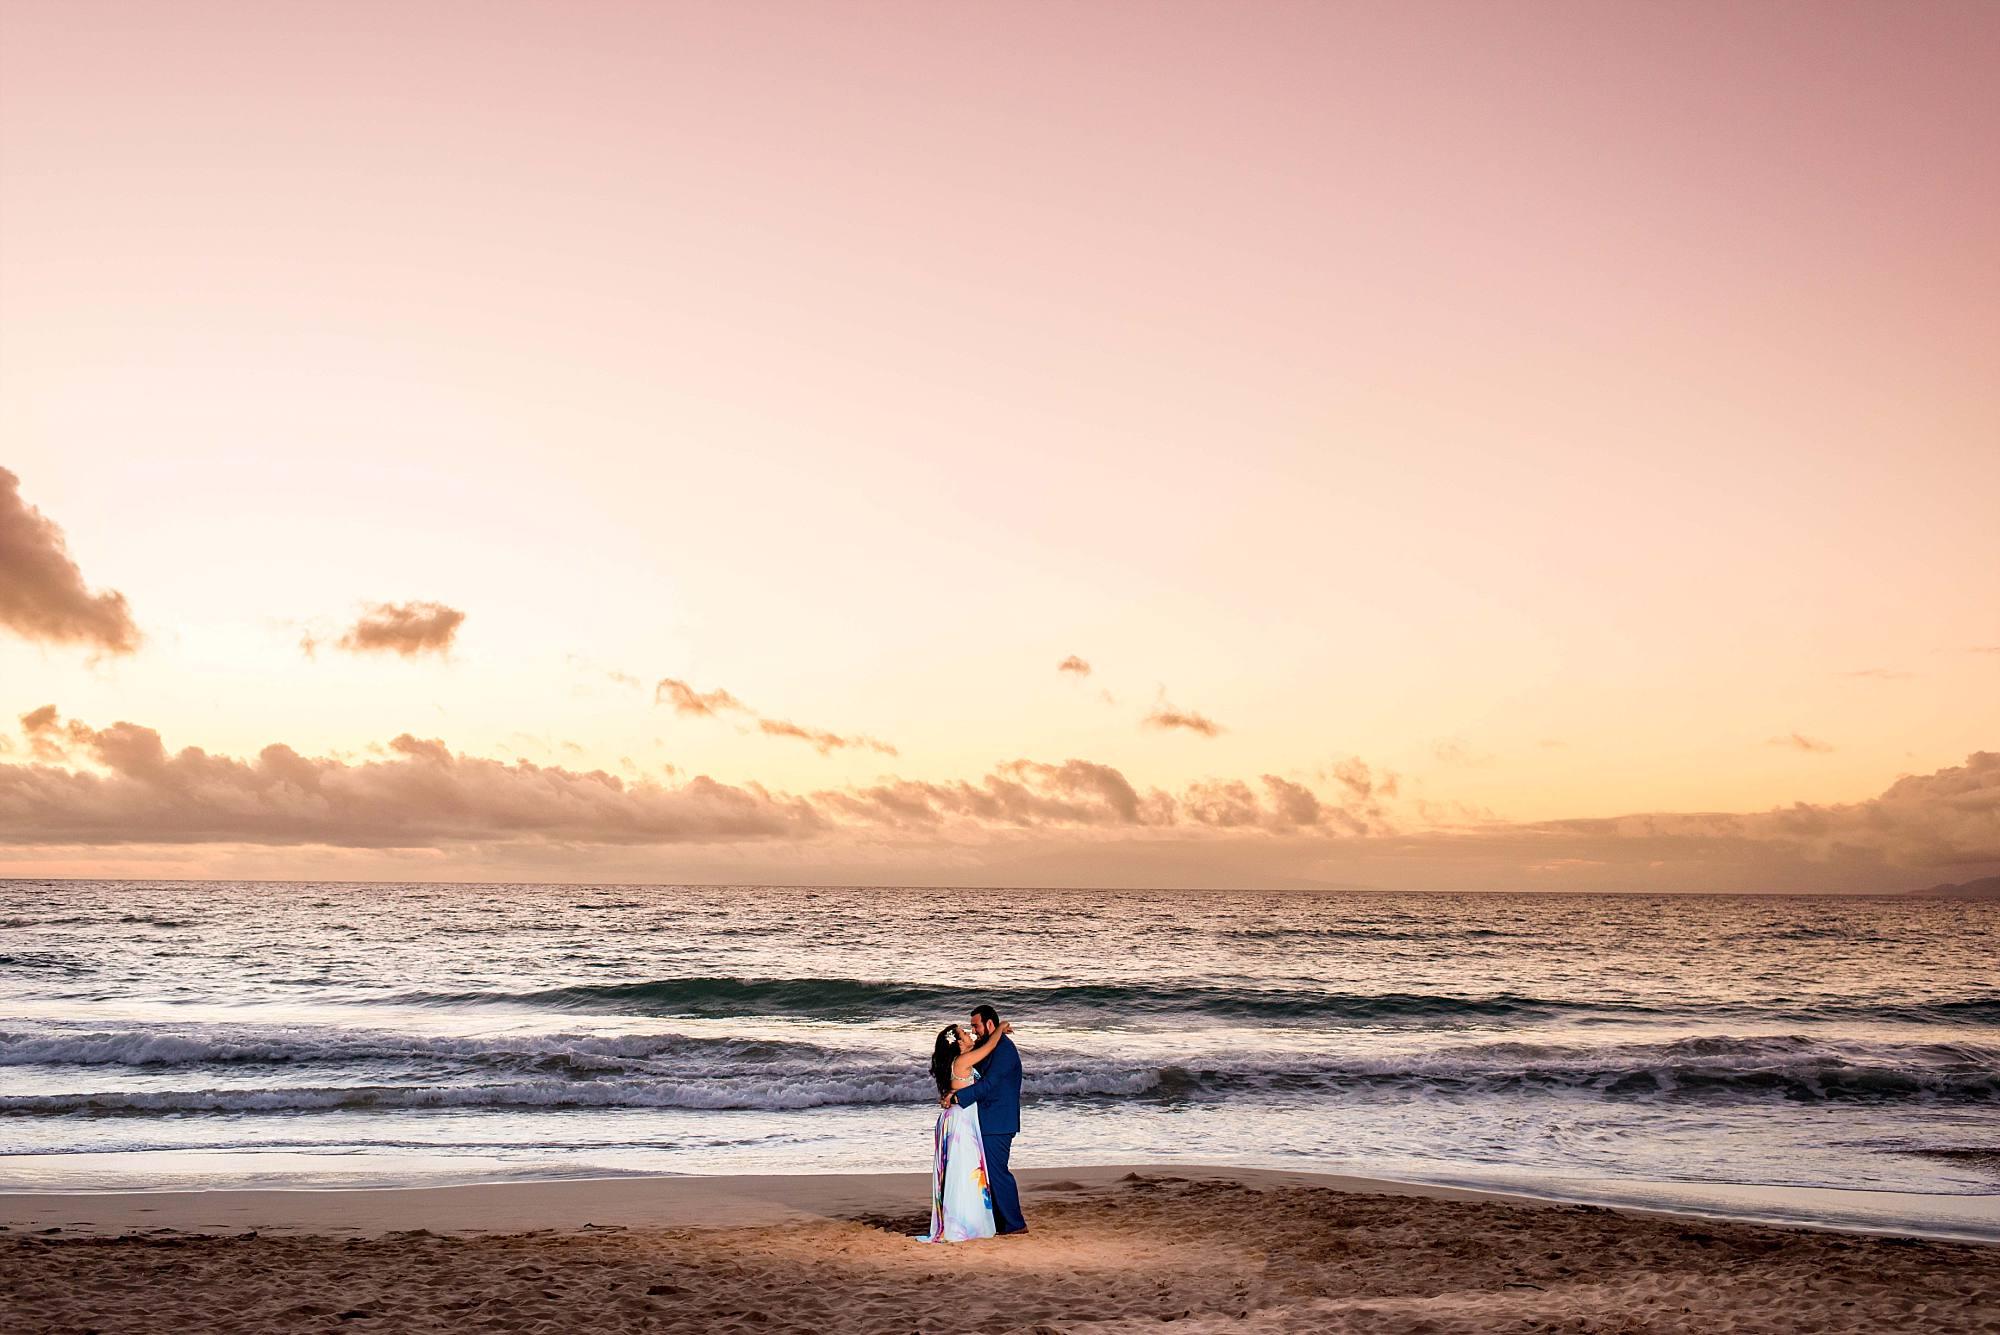 sunset lovers on the beach